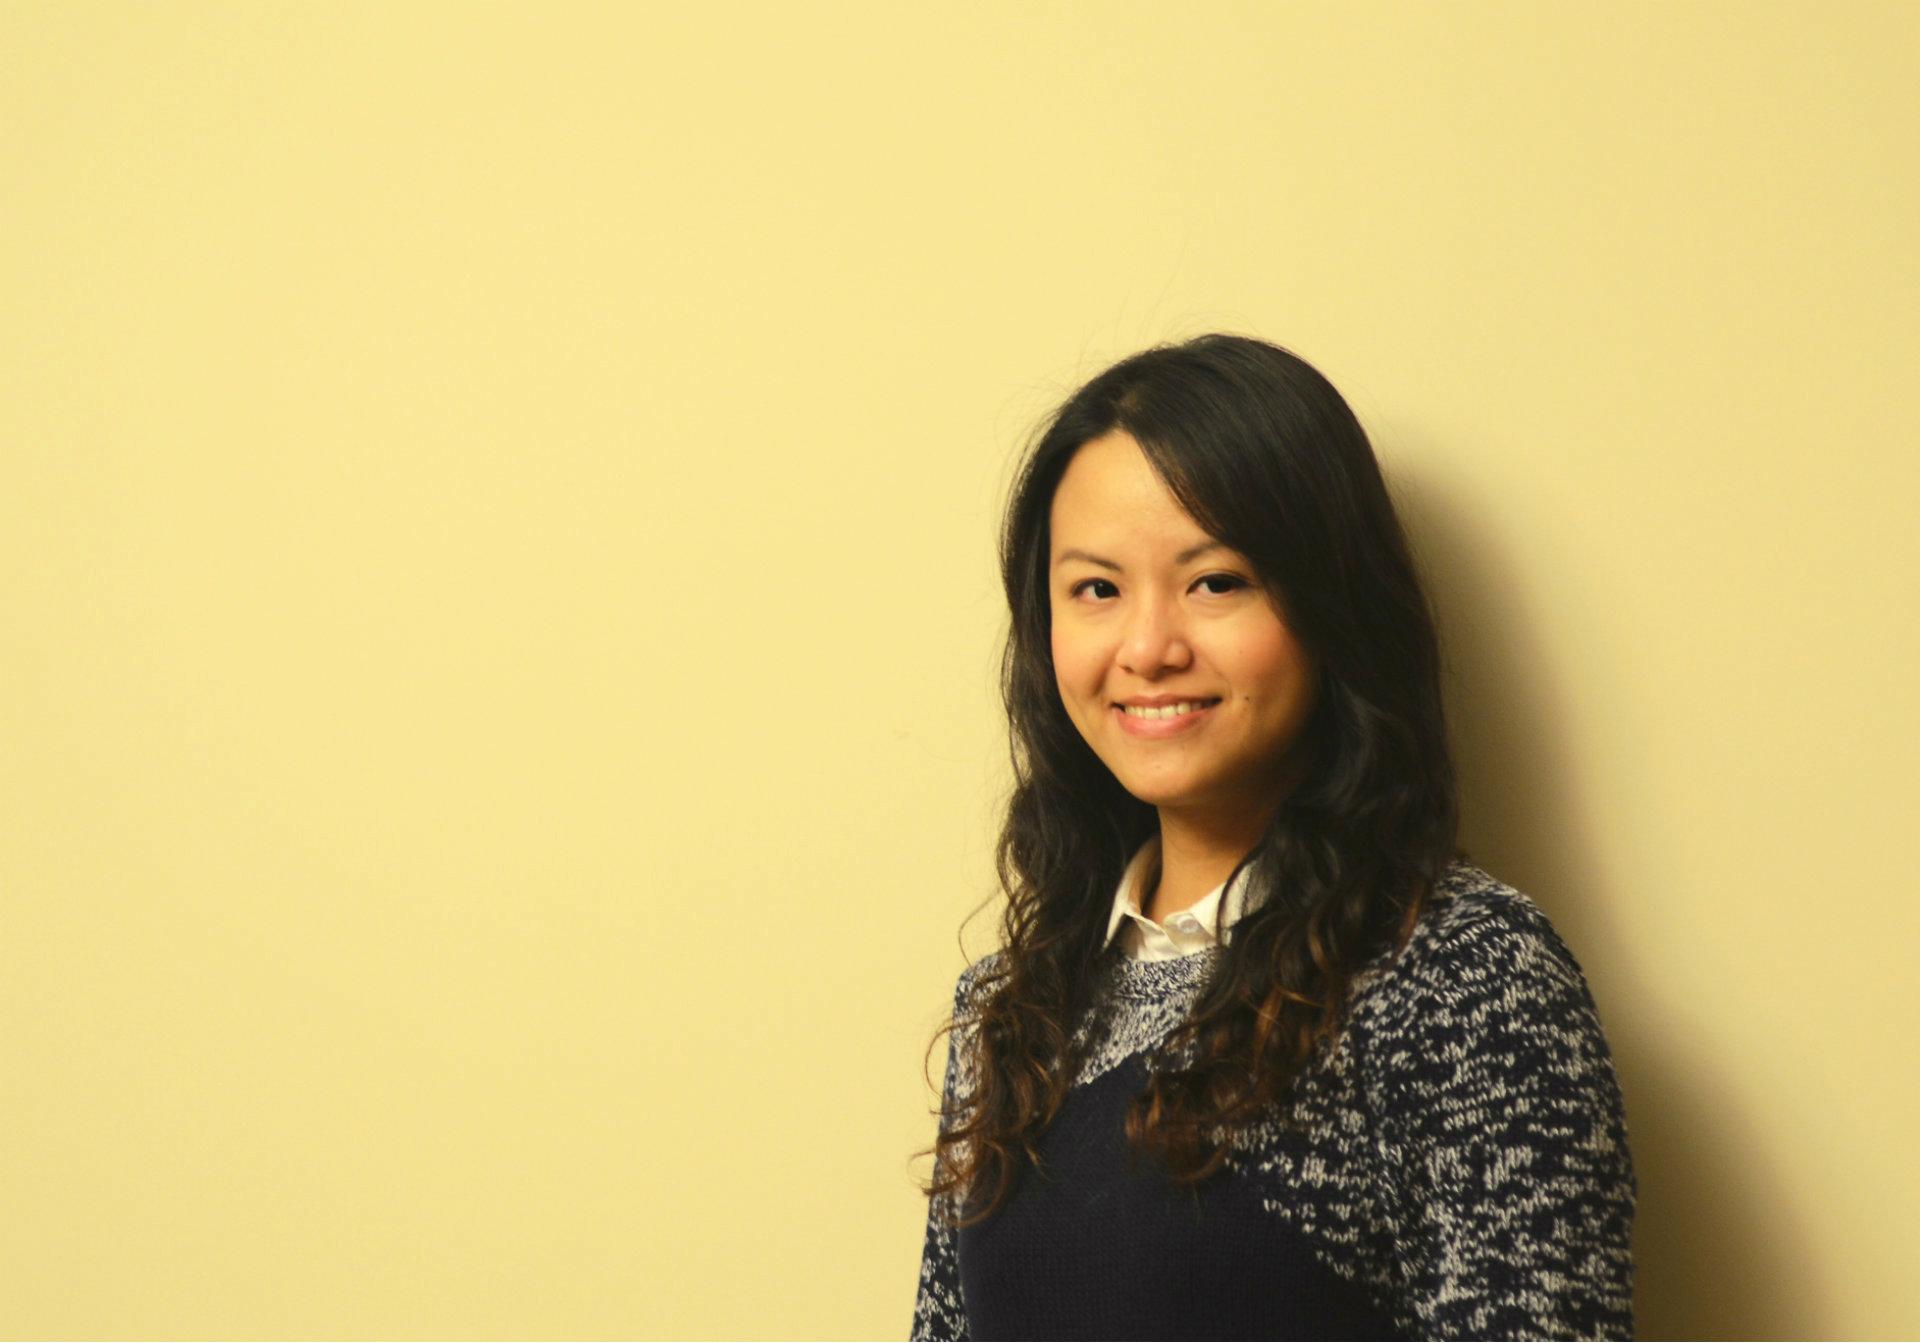 【語音專訪消費品業】起飛的上海,關鍵的七年:Johnson & Johnson Consumer 財務經理 Denise